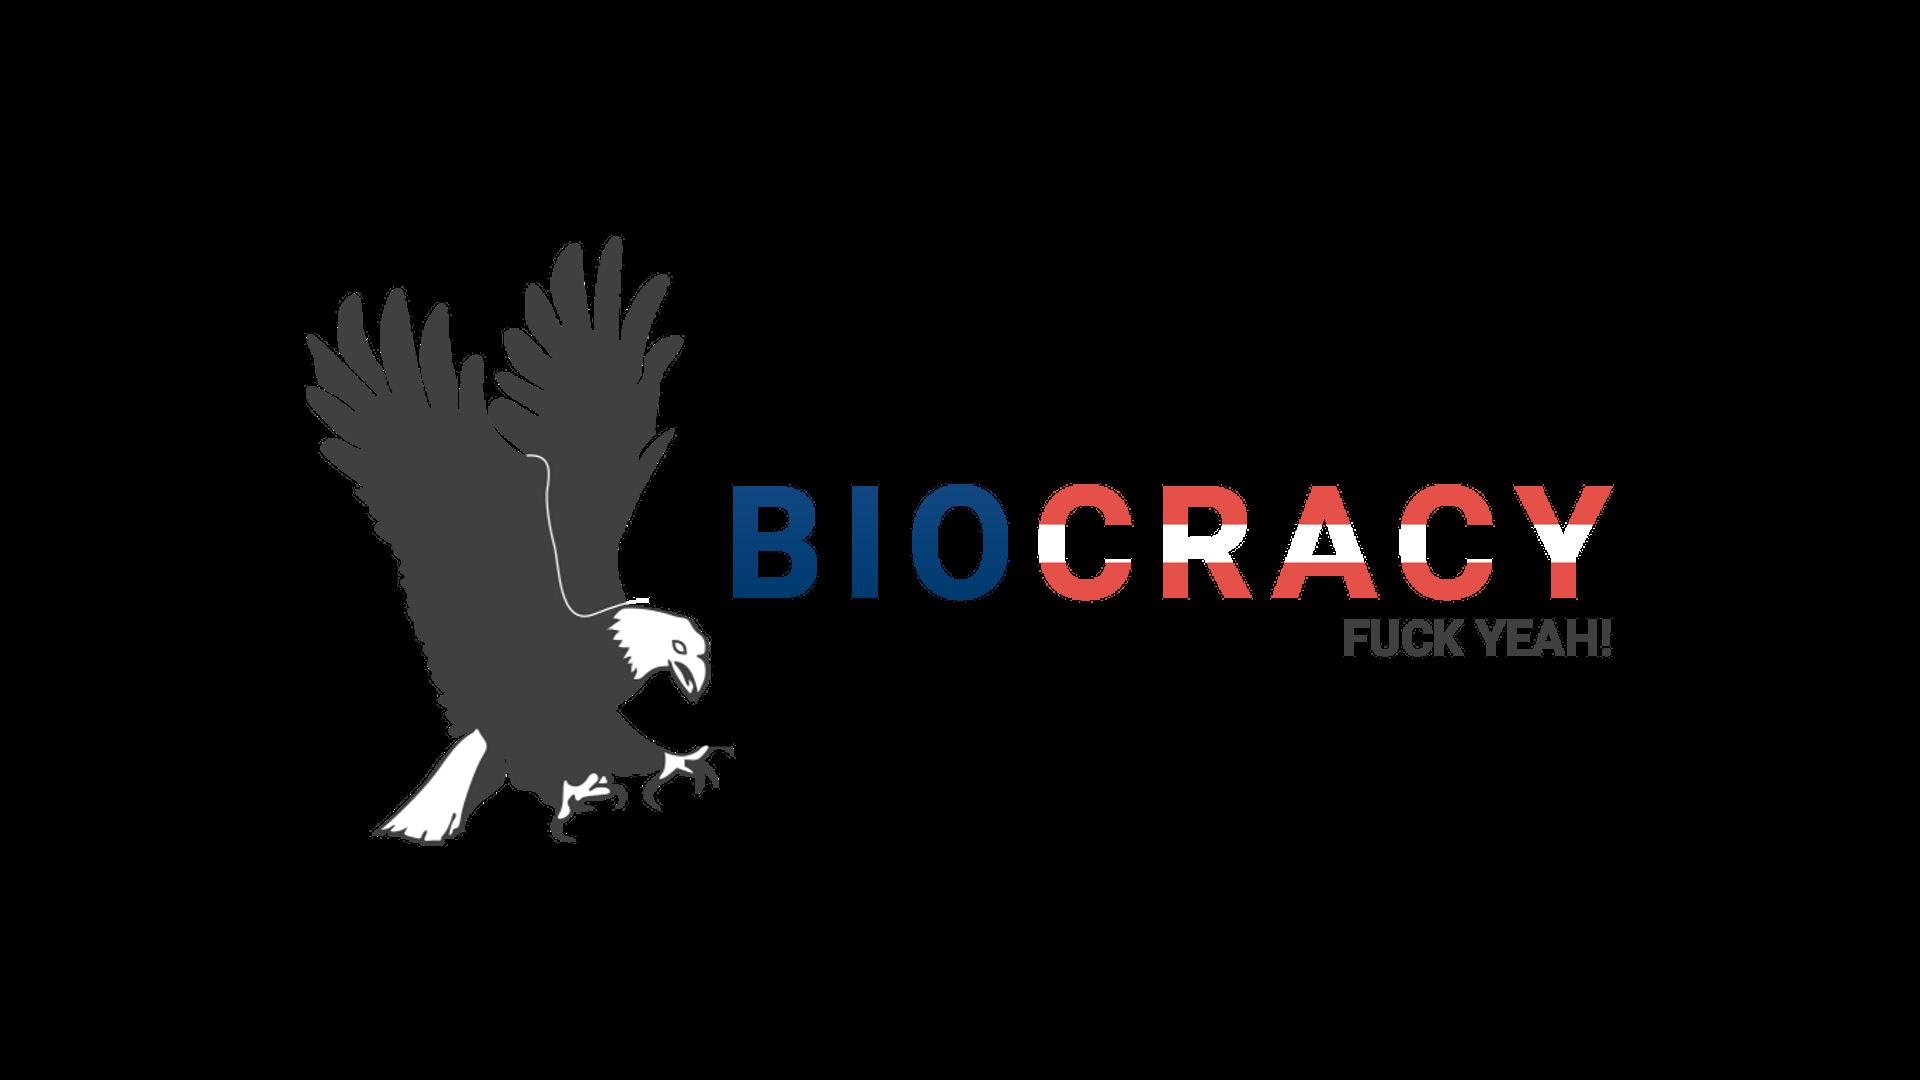 BioCracy